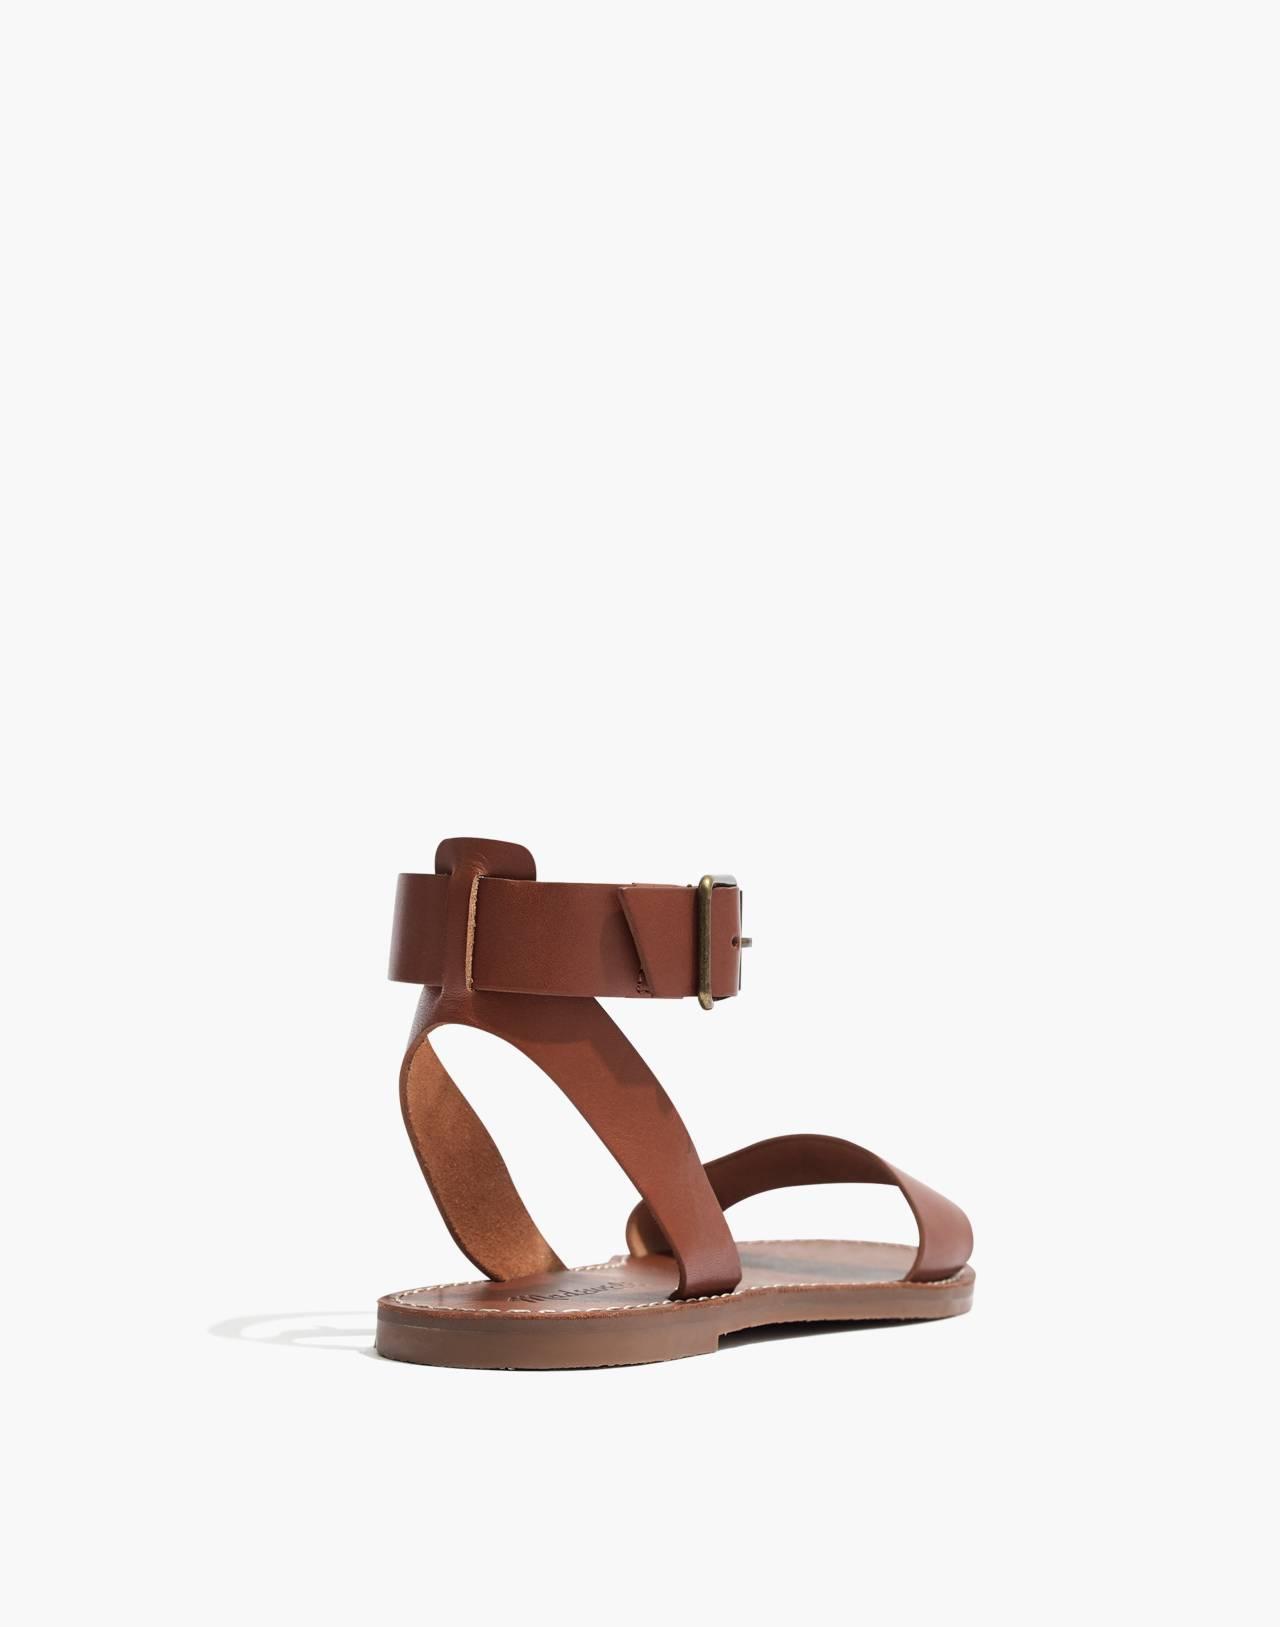 The Boardwalk Ankle-Strap Sandal in english saddle image 4